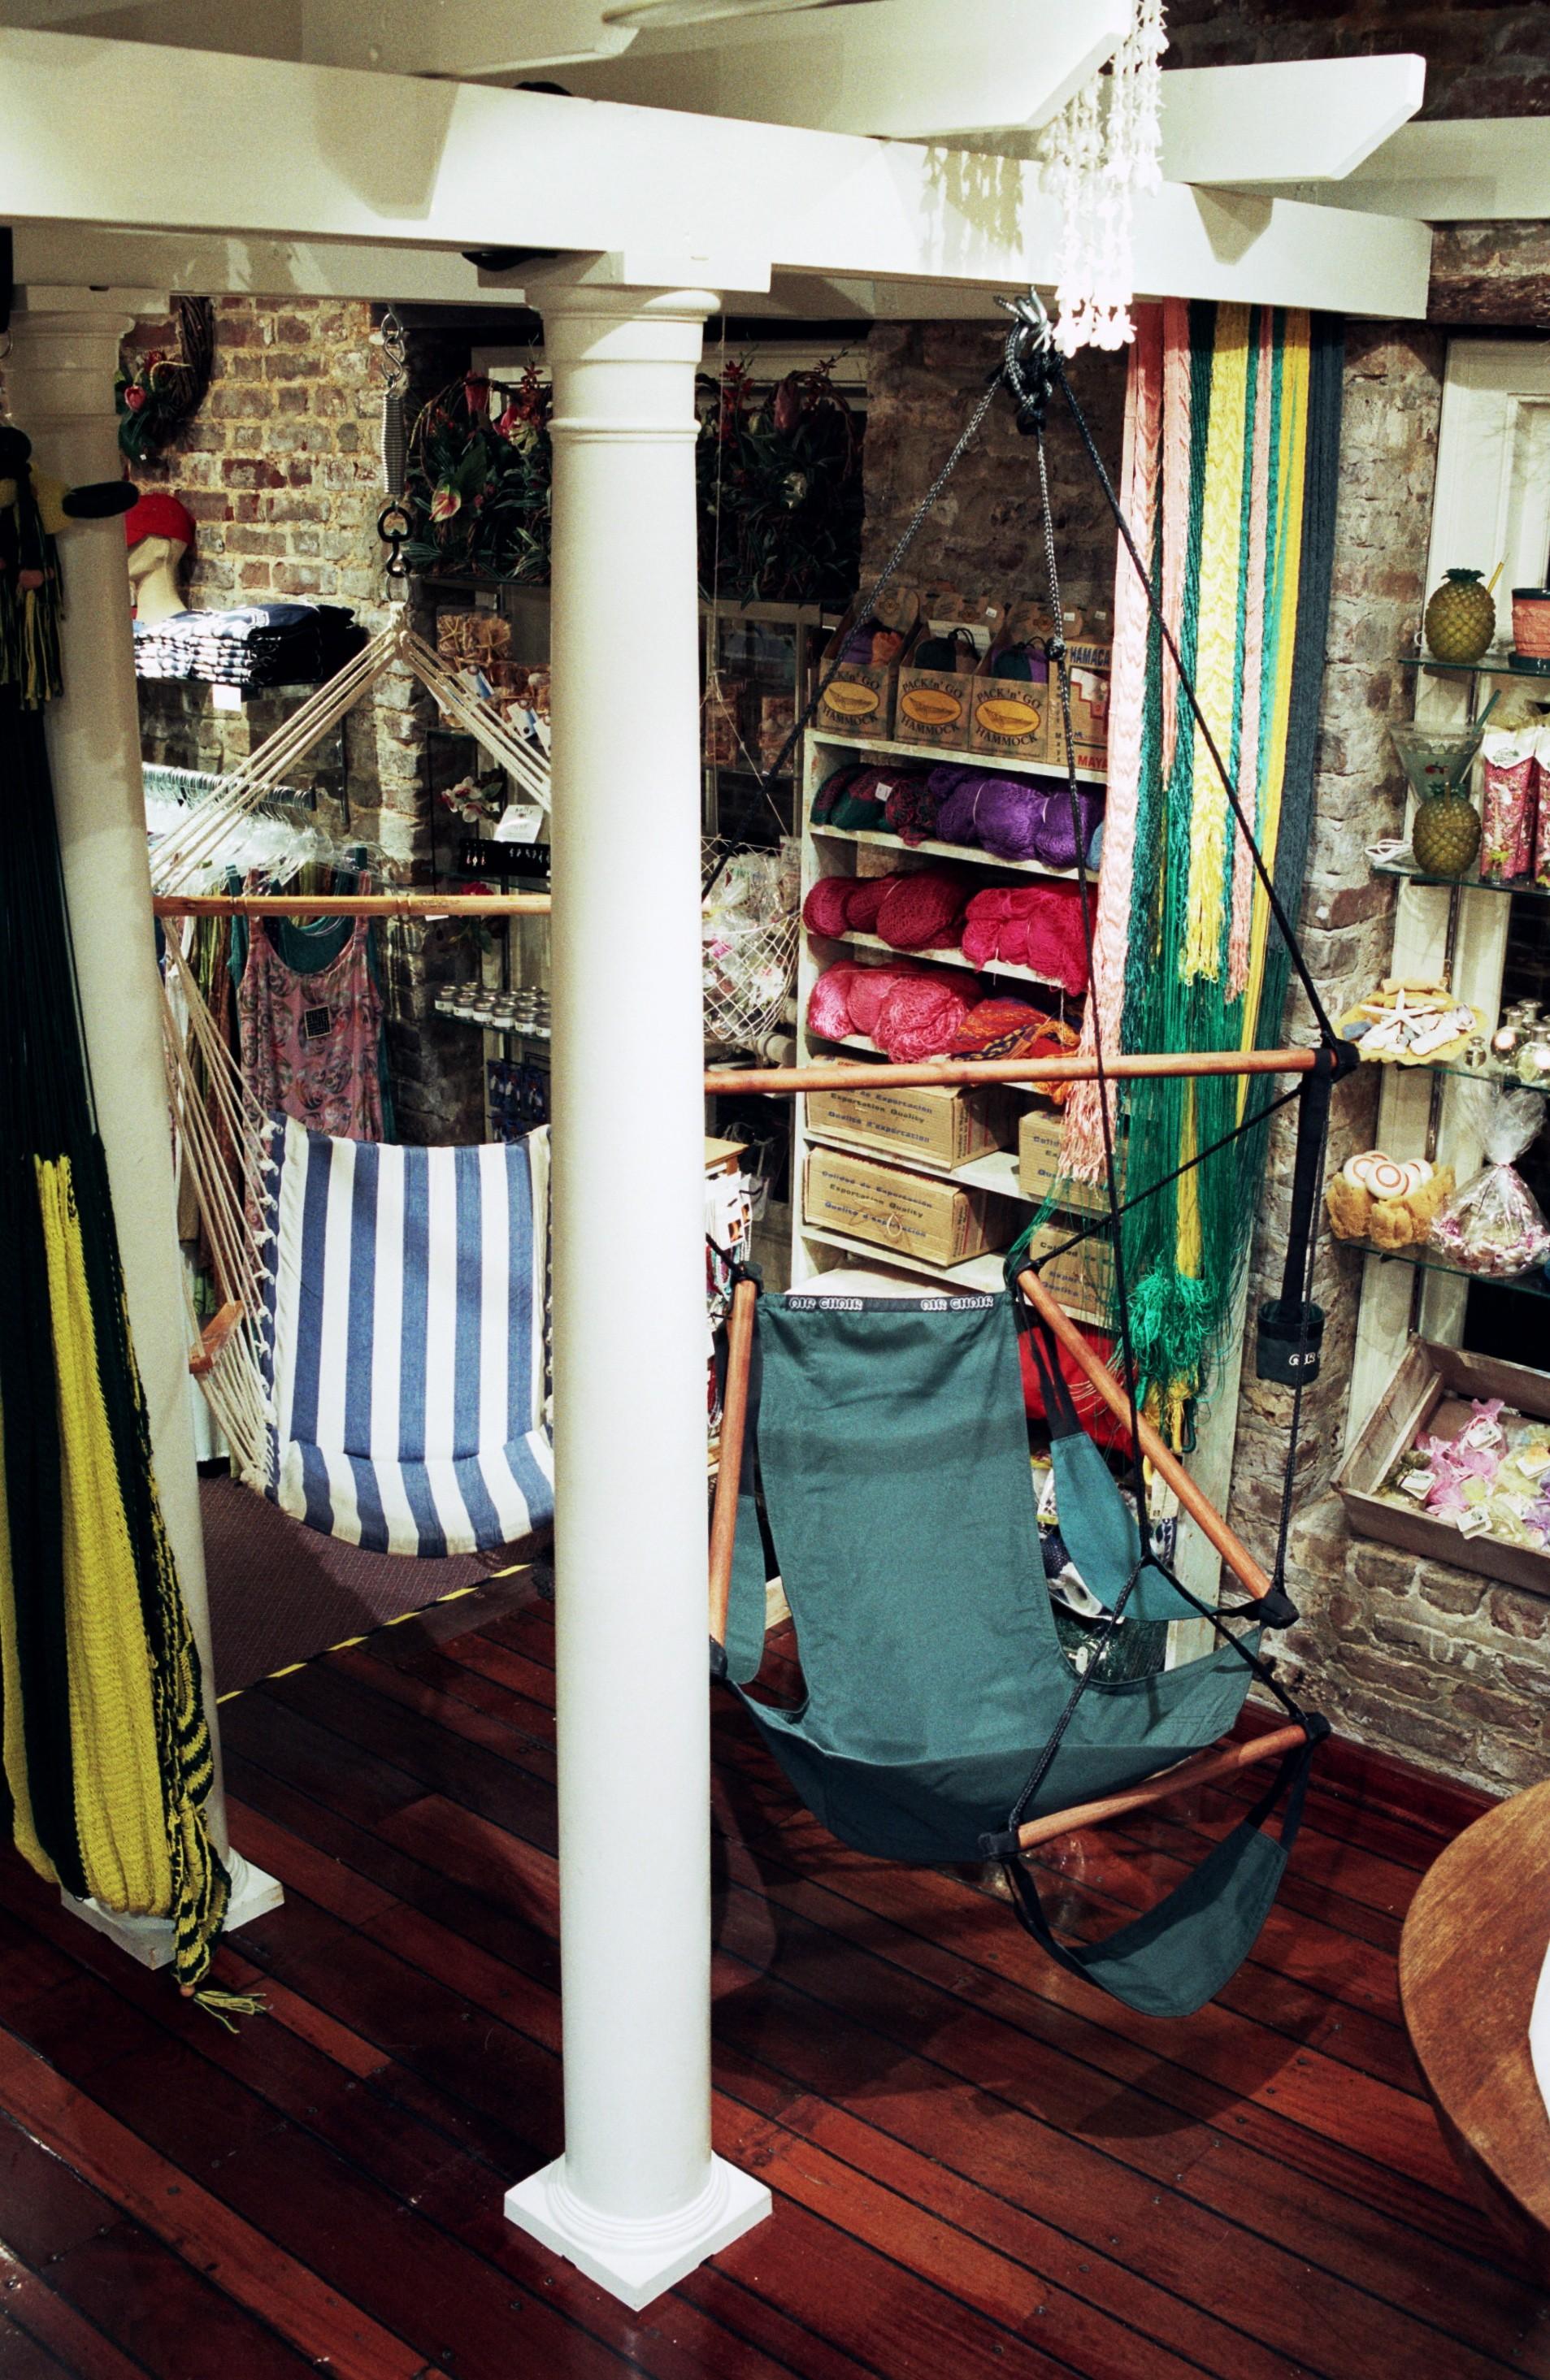 Palmetto Hammock Amp Resort Shoppe Captivates Customers With